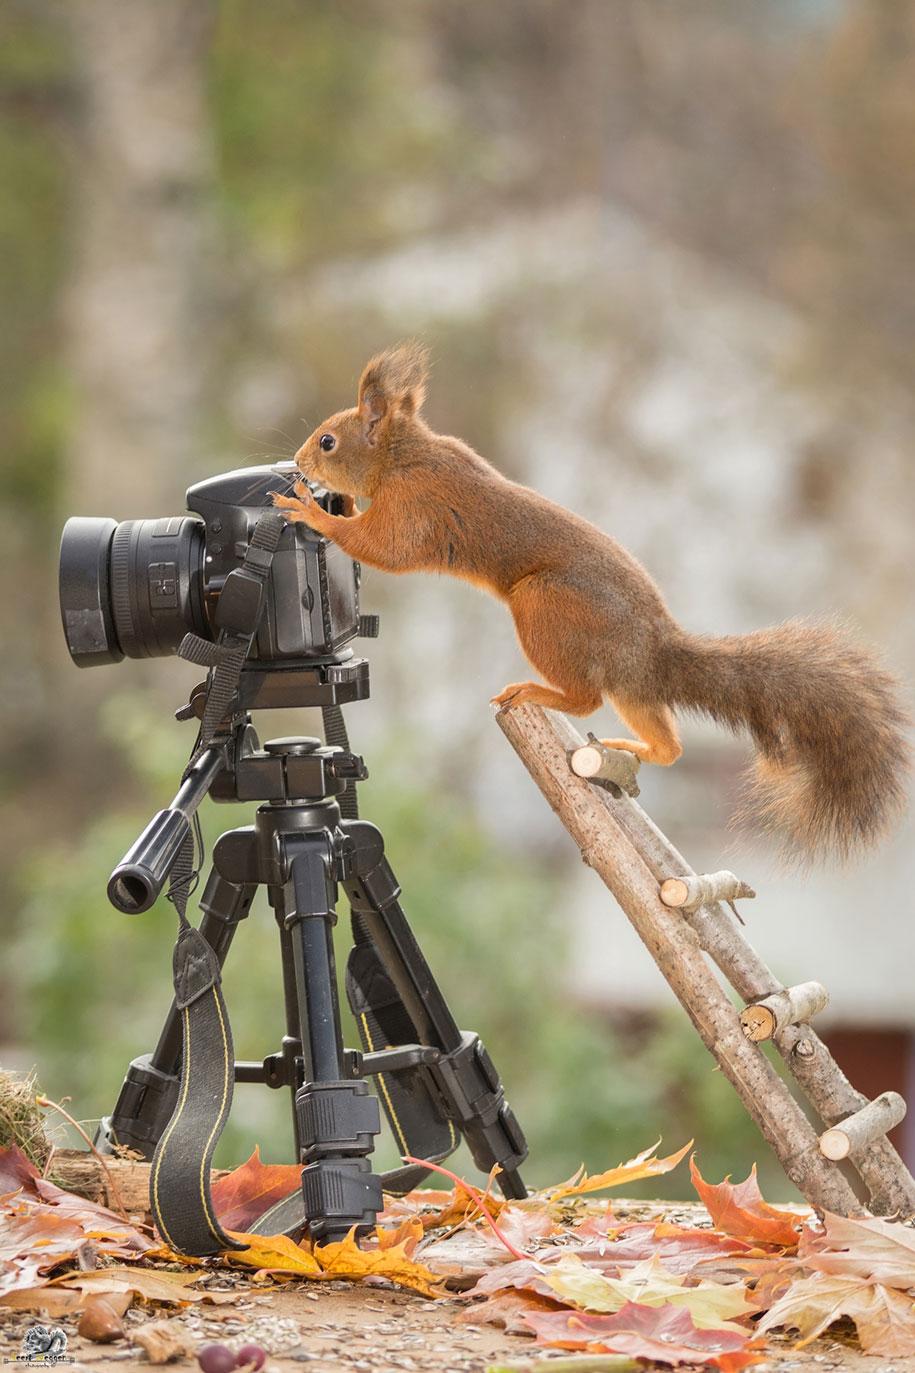 hilarious animal and camera photo